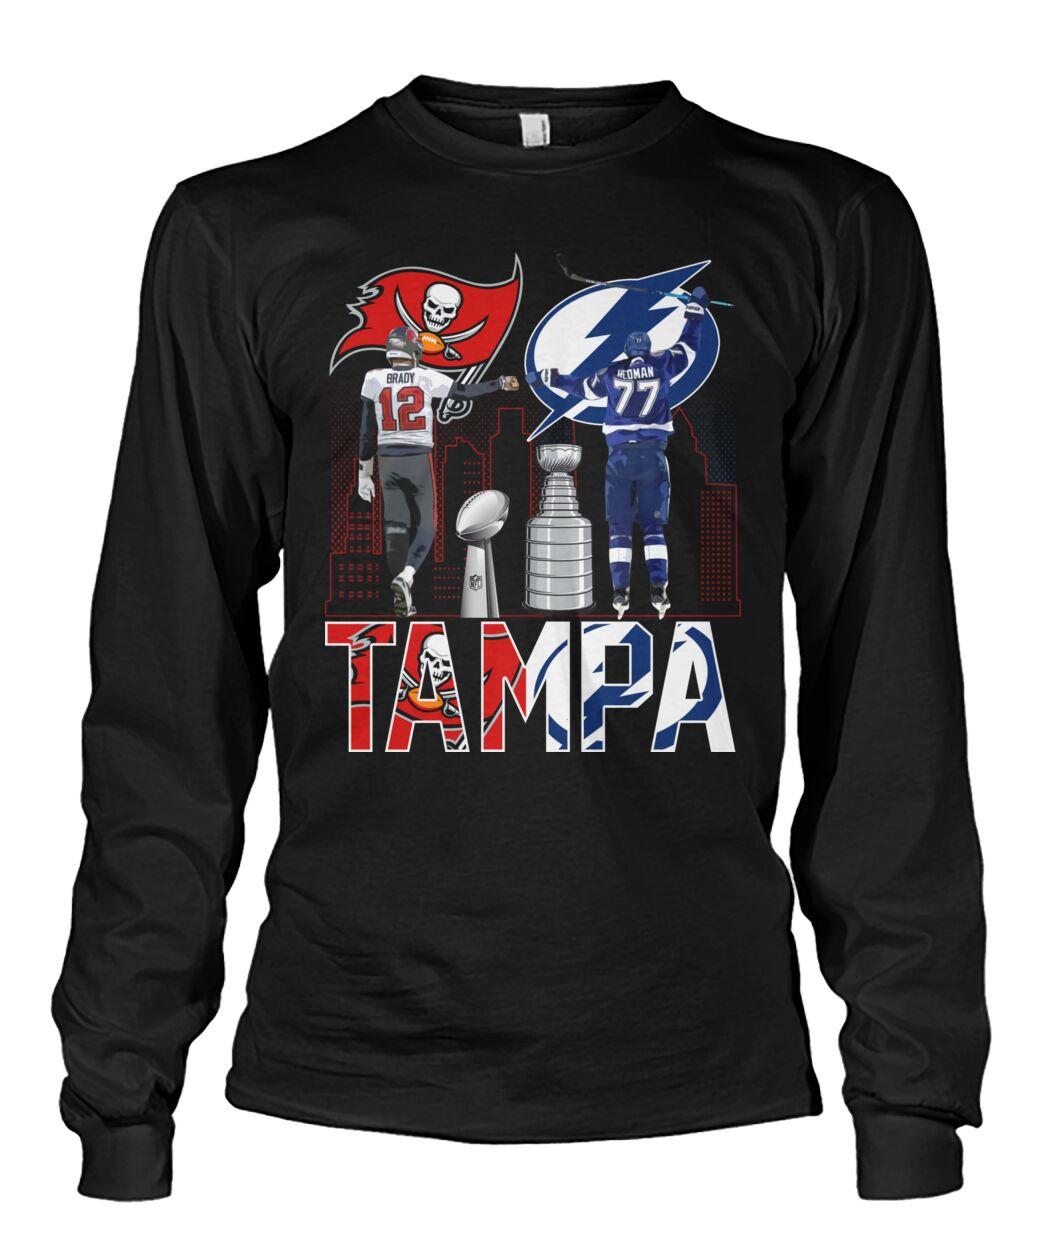 Tampa Brady 12 Heoman 77 shirt hoodie 13